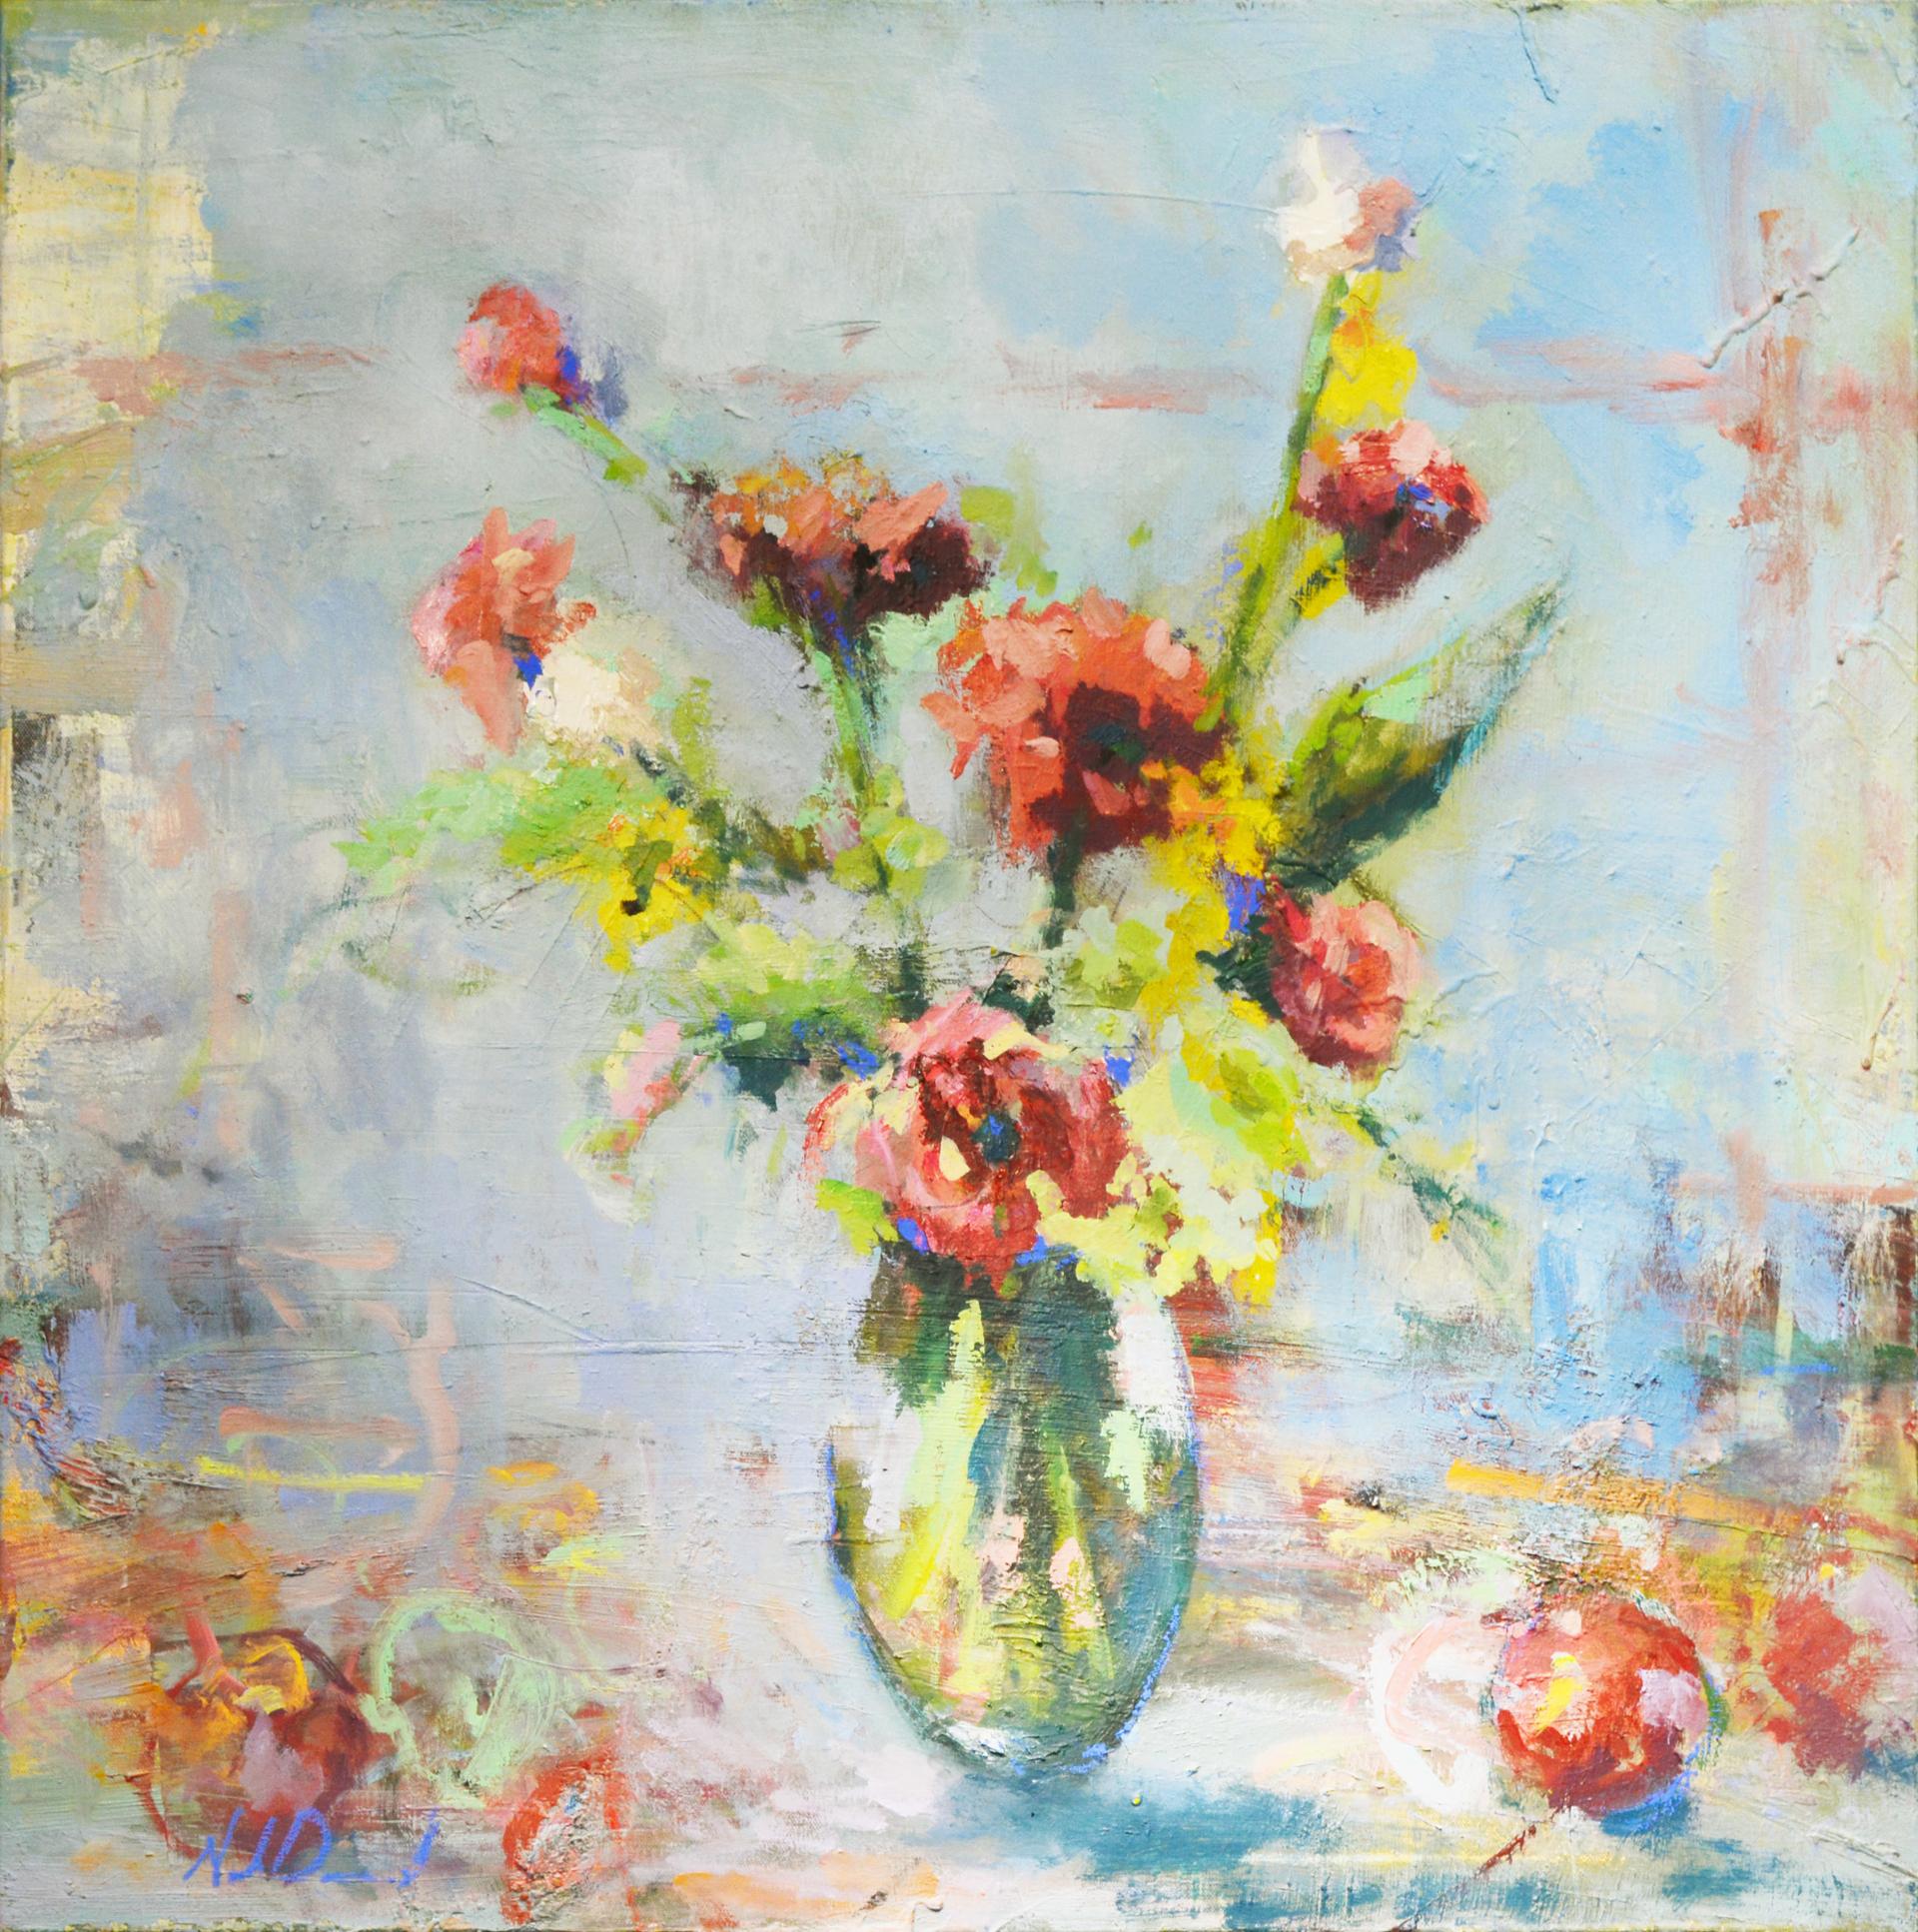 Garden Pick by Noah Desmond